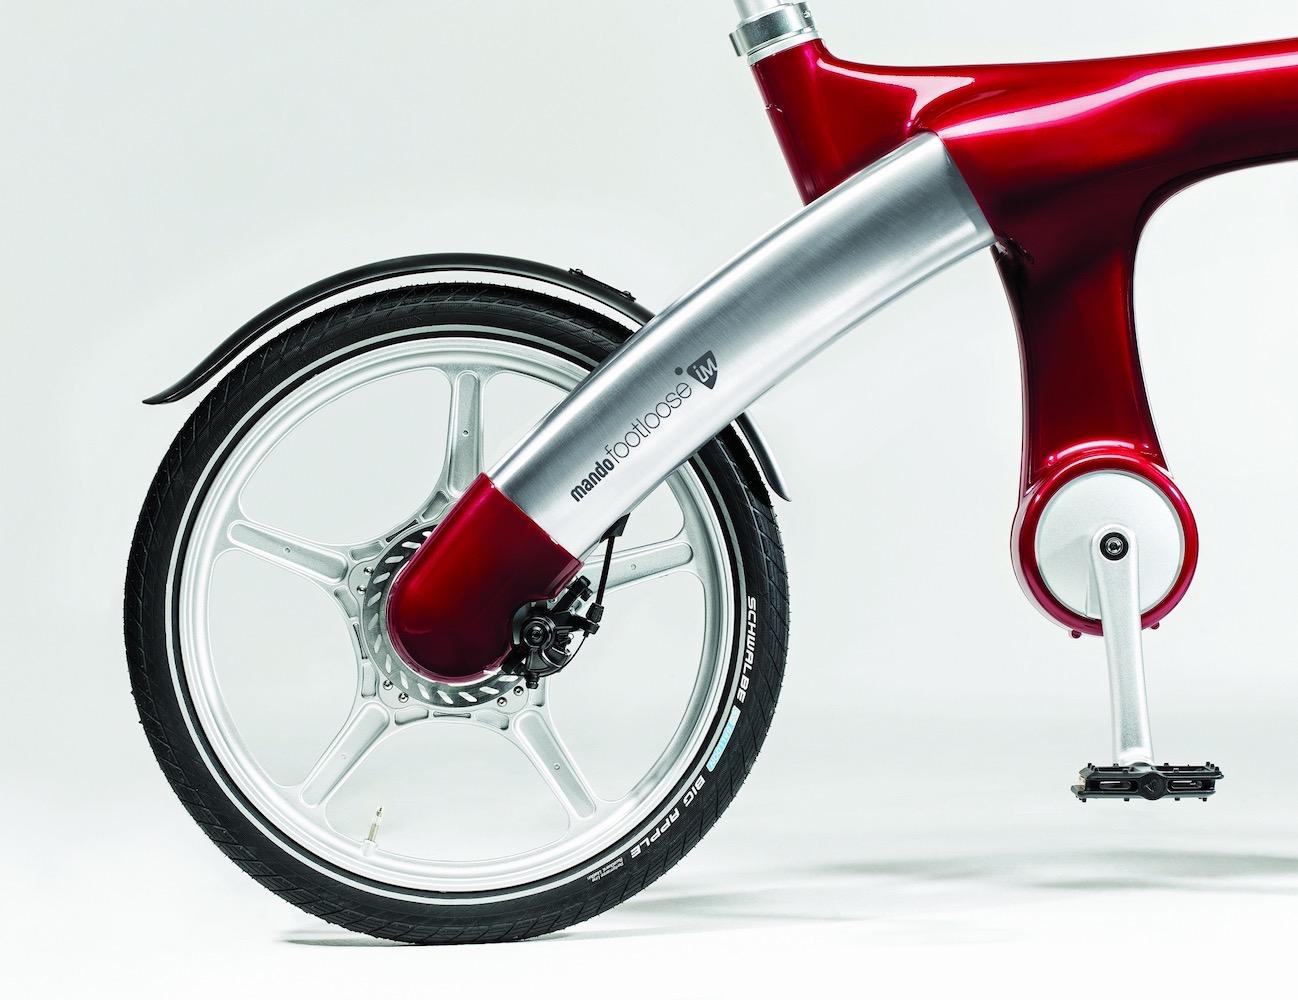 Mando+Footloose+IM%3B+Stylish+Chainless+E-bike